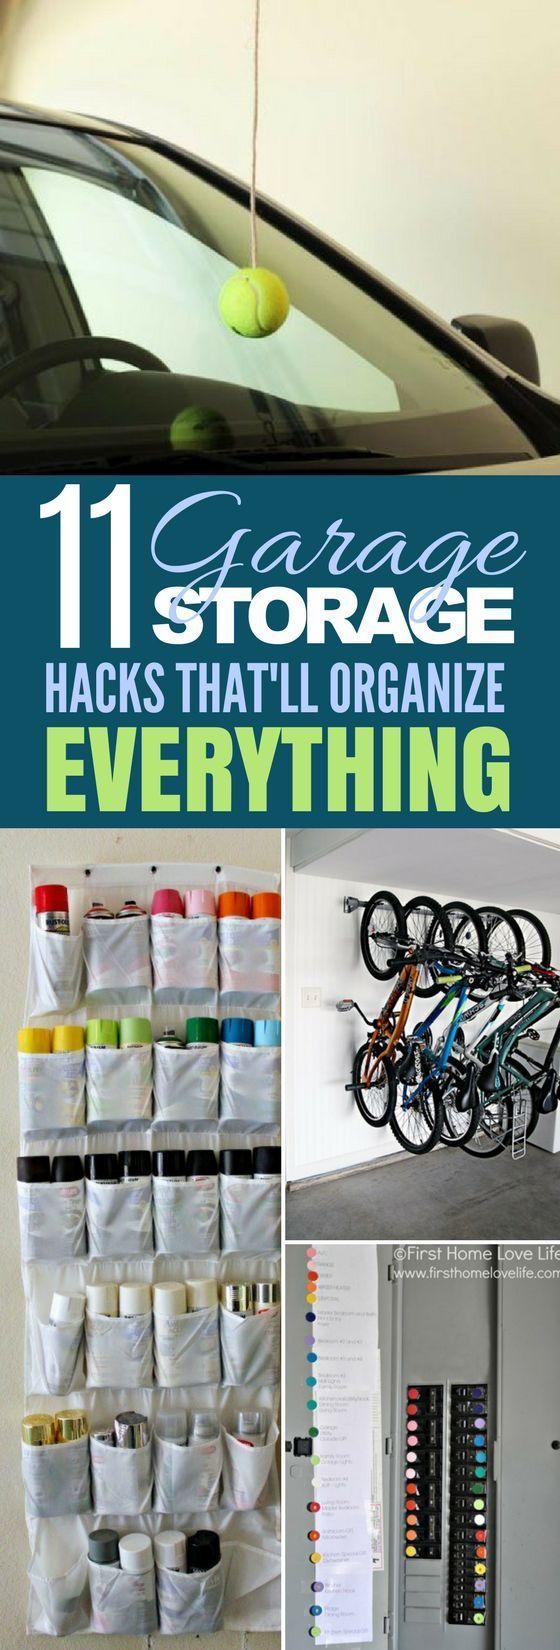 garage hacks 11 ways to organize with diy projects diy on best garage organization and storage hacks ideas start for organizing your garage id=72854